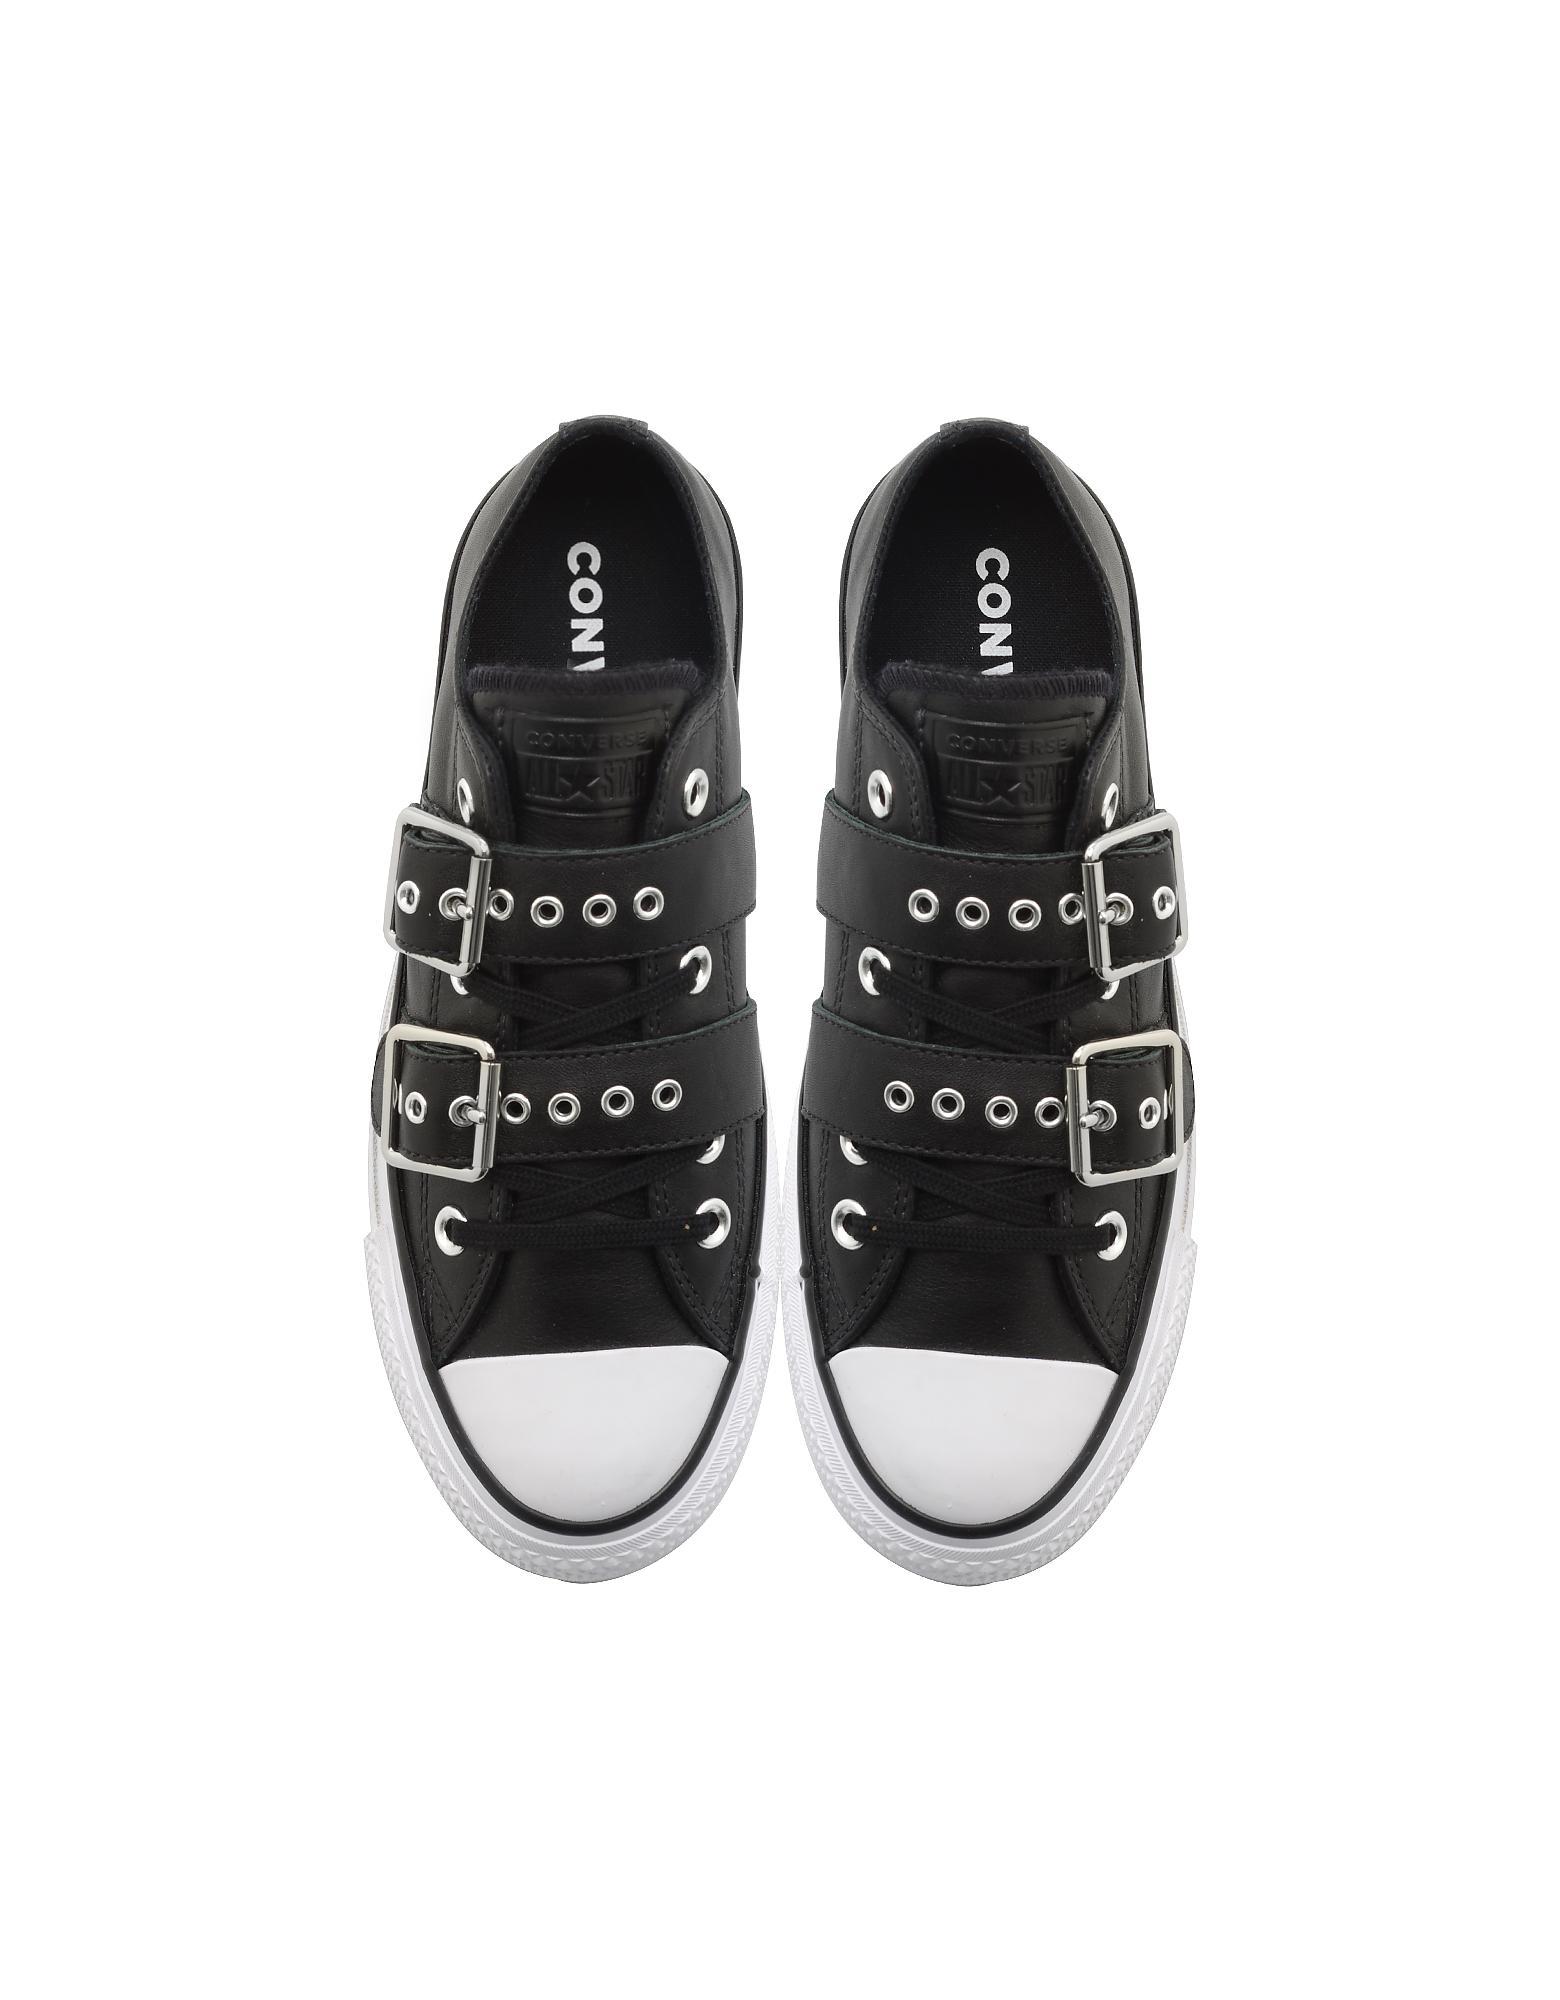 0655b192593cc2 Converse Chuck Taylor All Star Lift Buckle Black Platform Sneakers ...